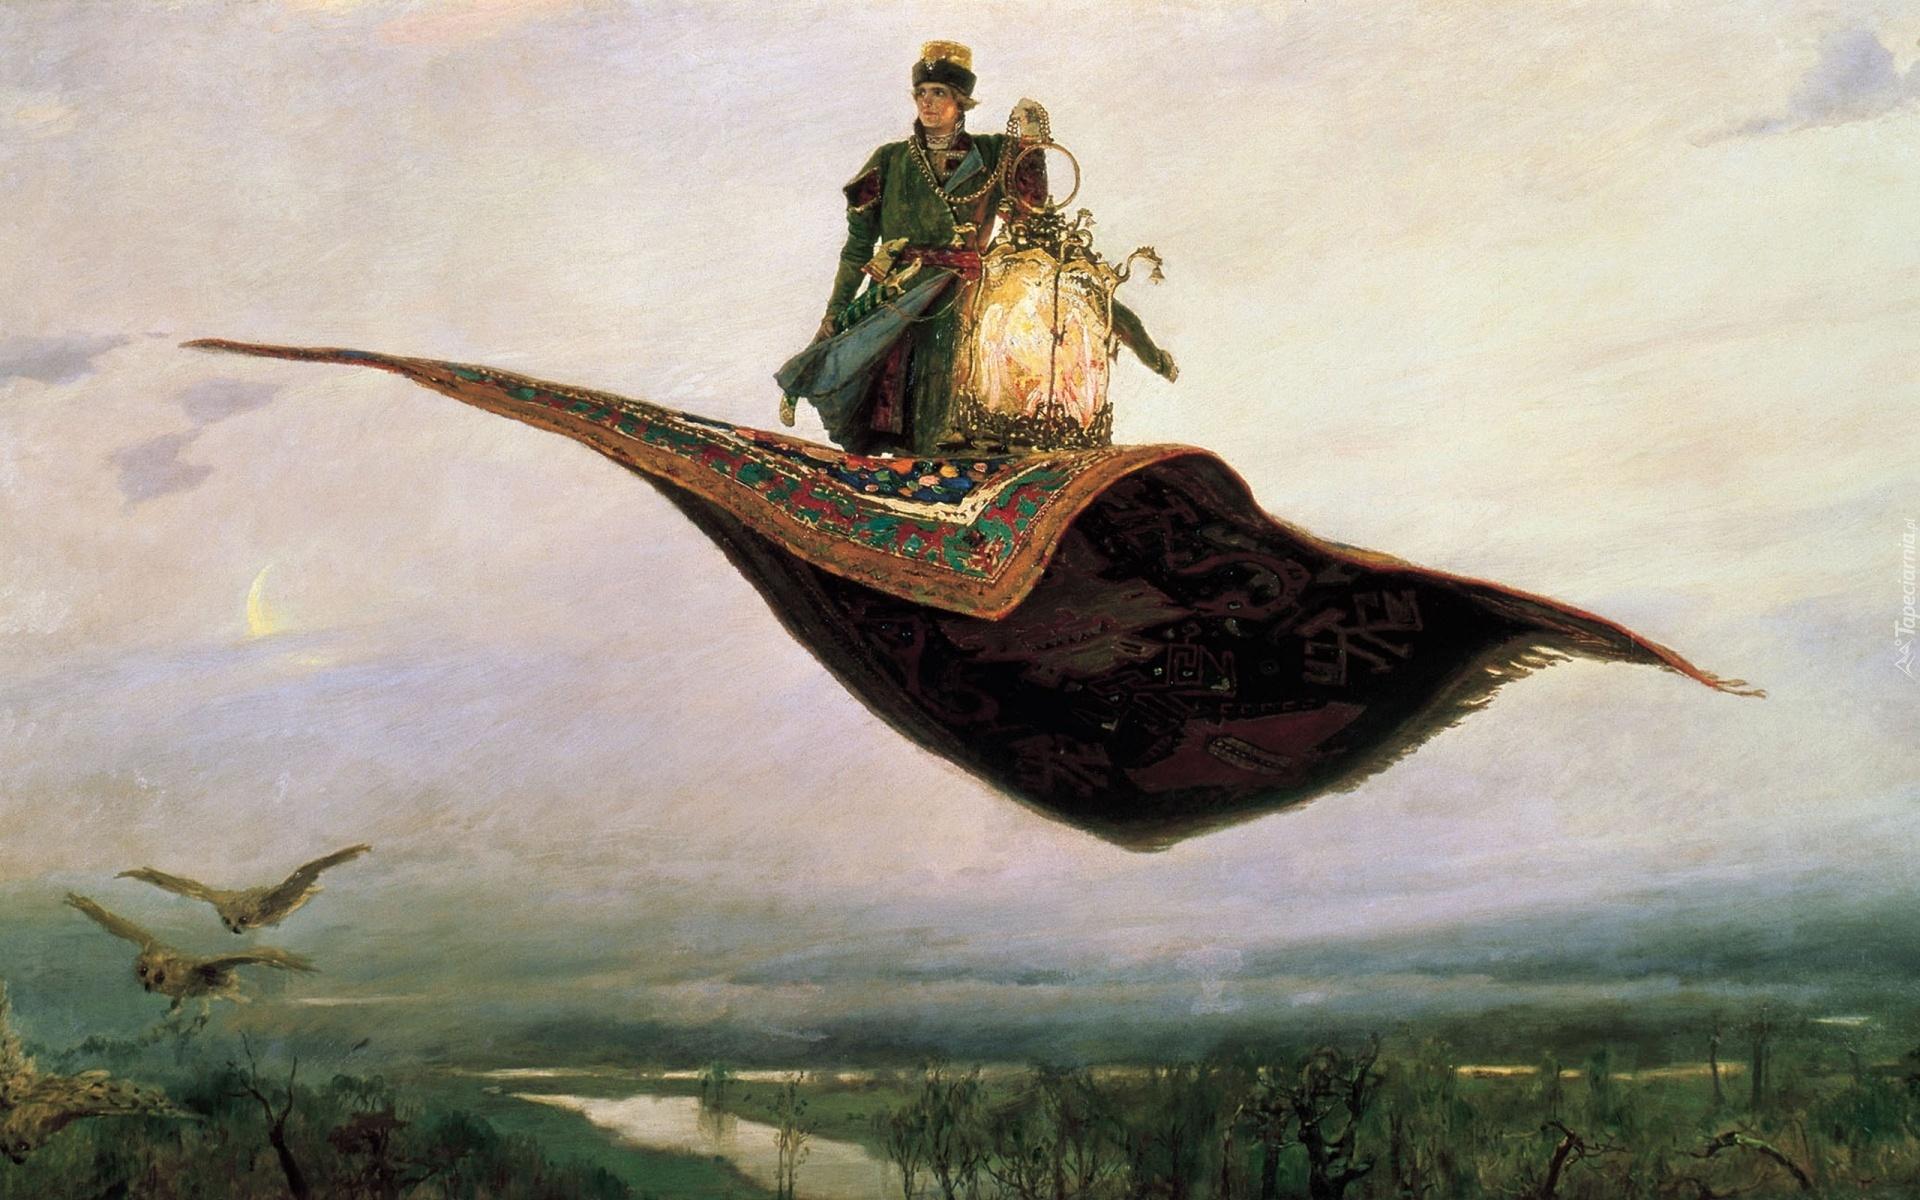 Сказки - Наука о литературе (Вып. 12) 163400_obraz_reprodukcja_latajacy_dywan_mezczyzna